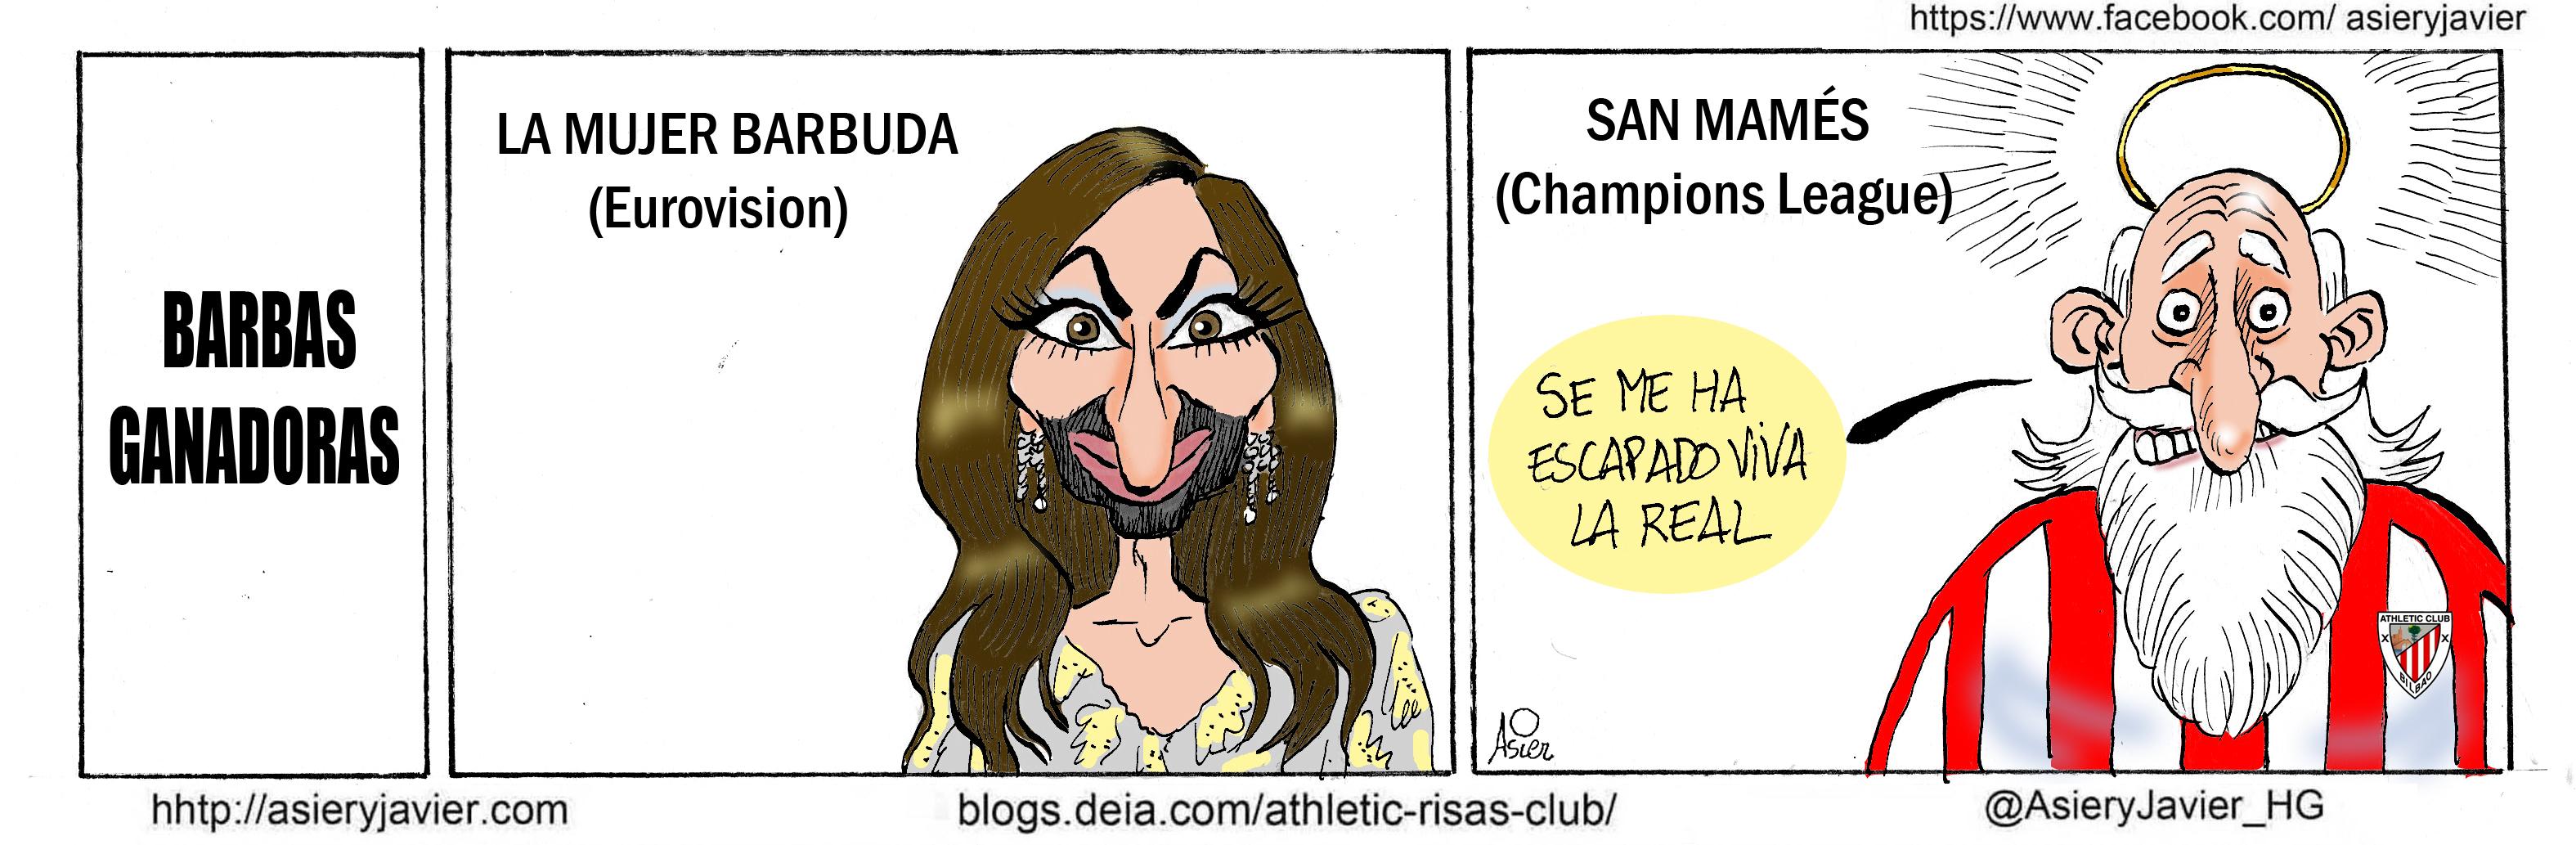 Al Athletic se le escapa viva la Real de San Mamés. Barbas, Cristina Wurst, Viñeta, Humor, Eurovisión.